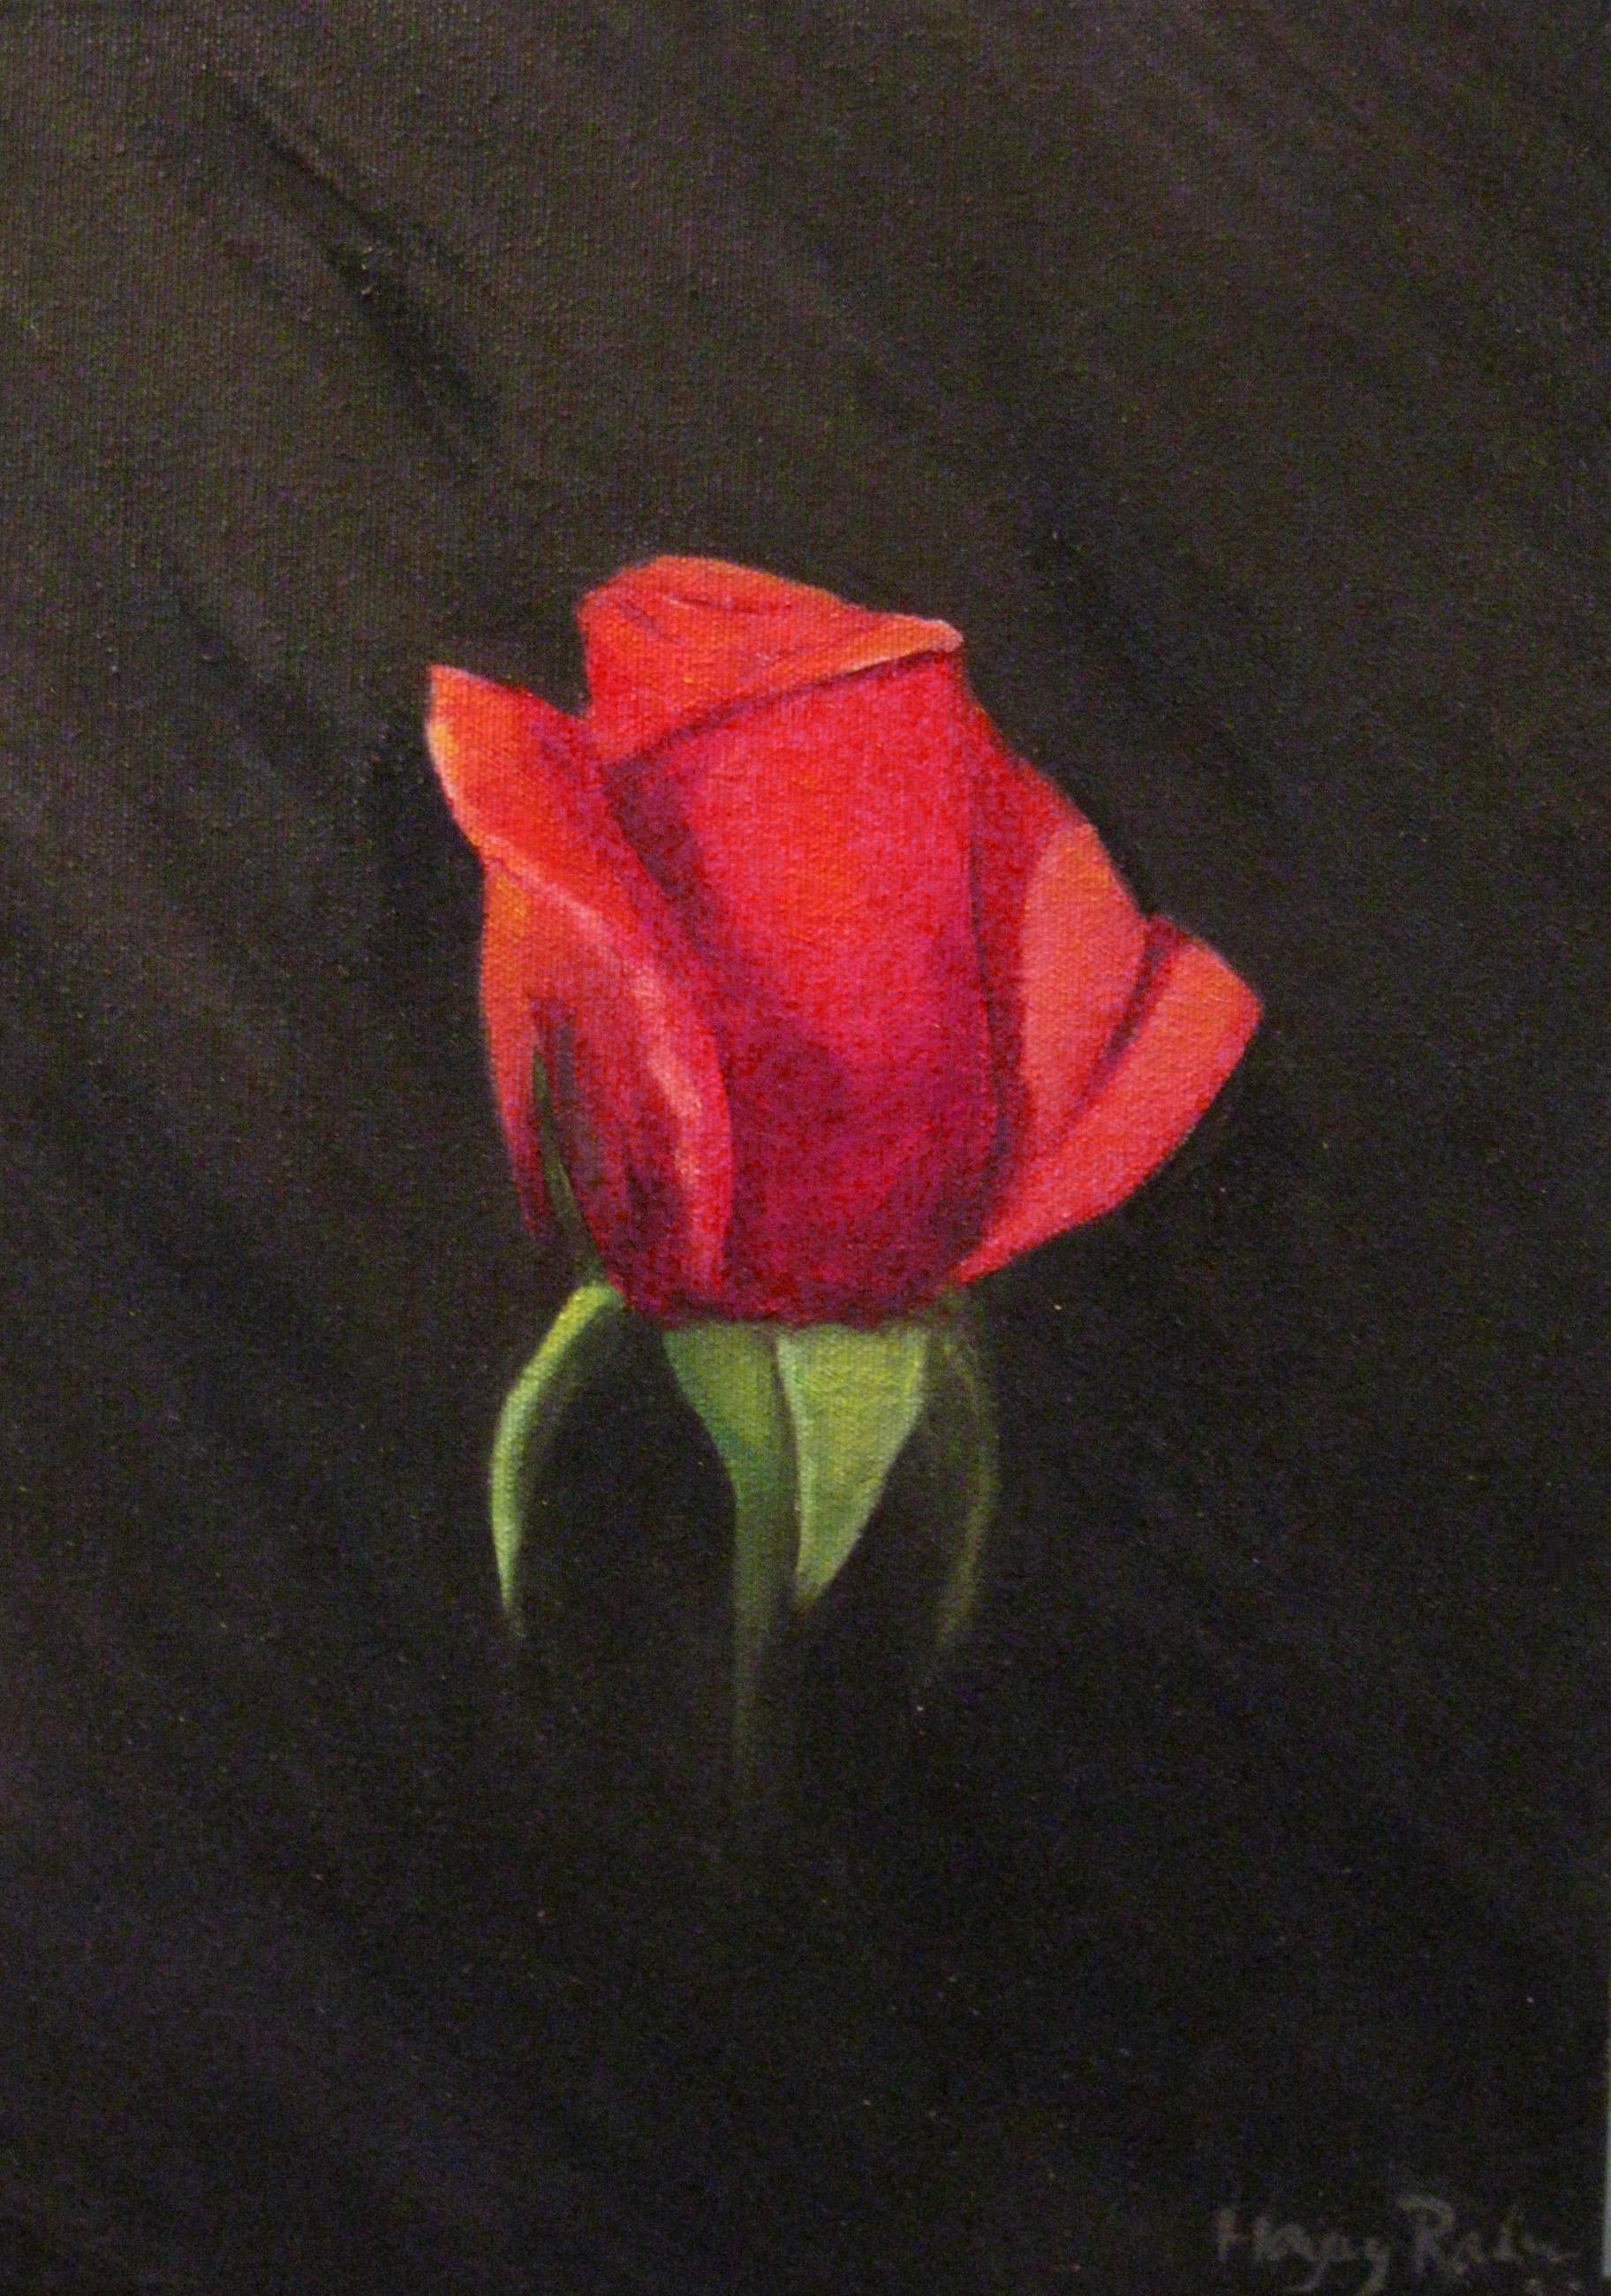 Best Red Rose Print